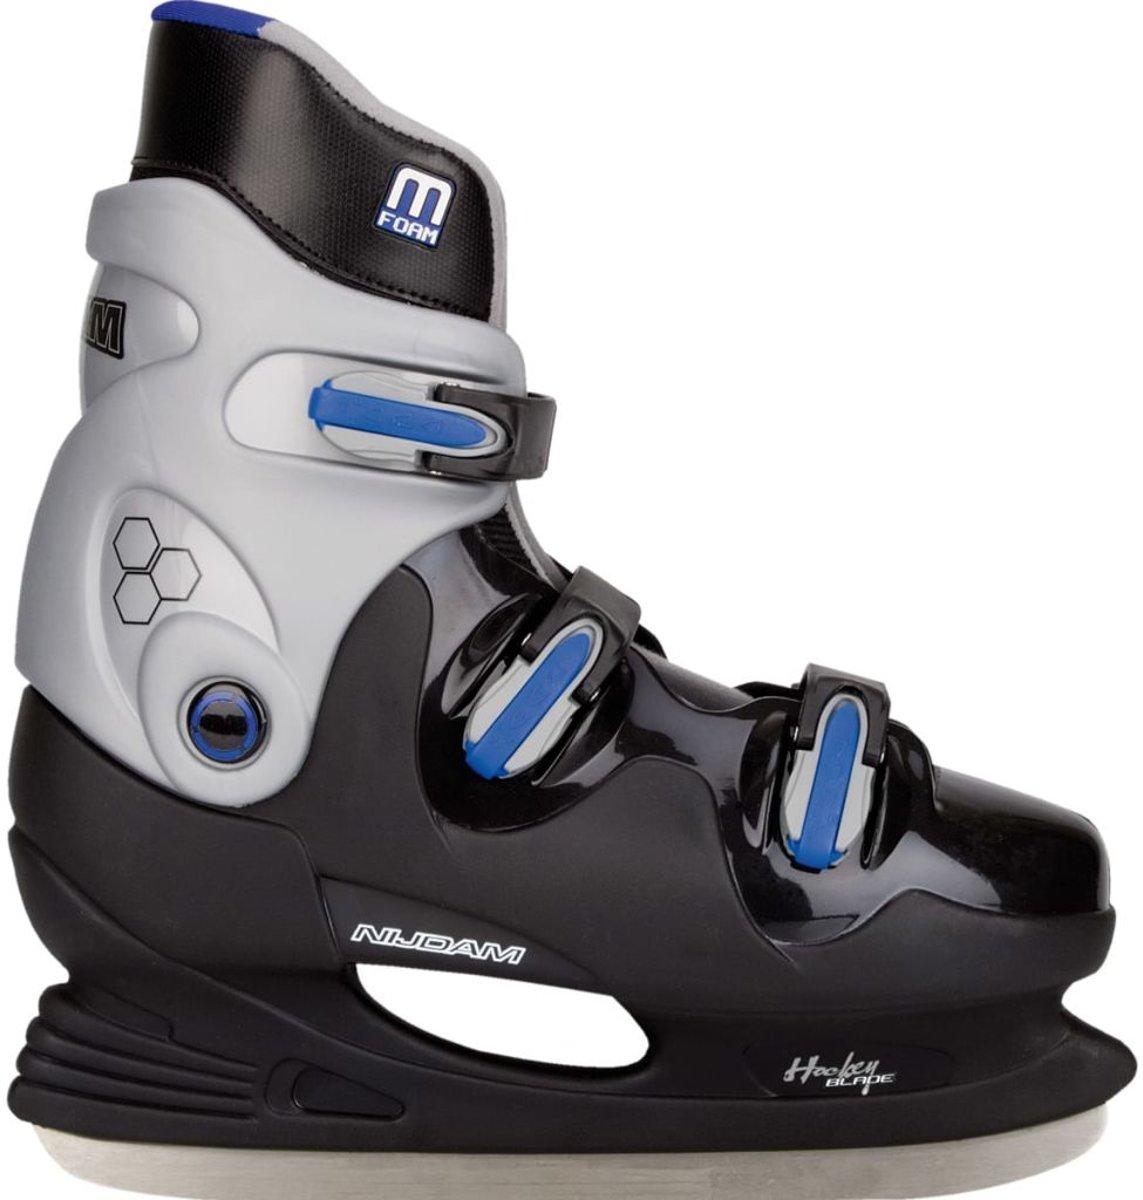 Nijdam 0089 IJshockeyschaats - Hardboot - Zwart/Blauw - Maat 43